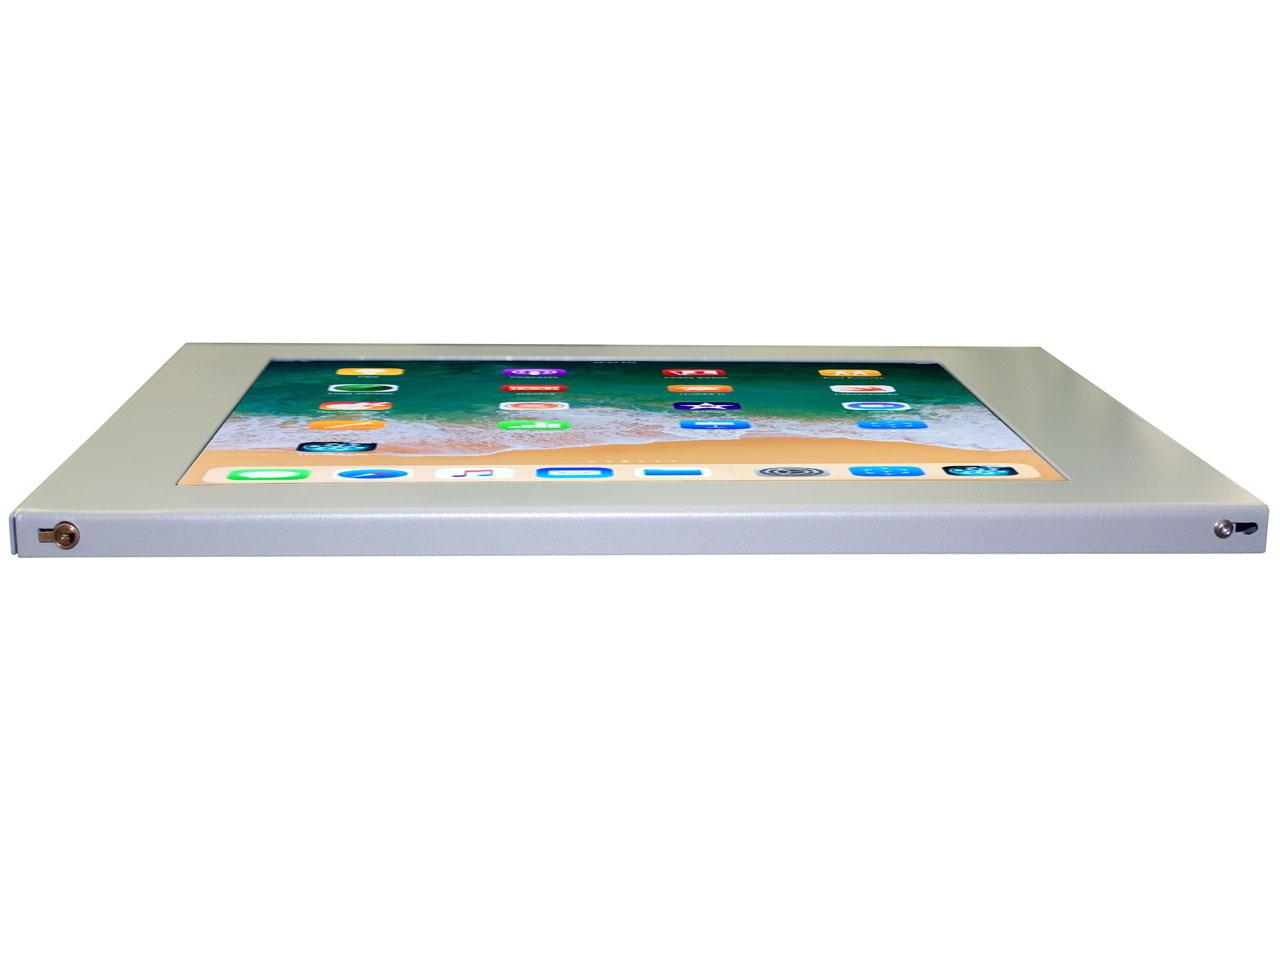 Tablet Schutzgehäuse Apple IPad Pro 10.5 Zoll Günstig